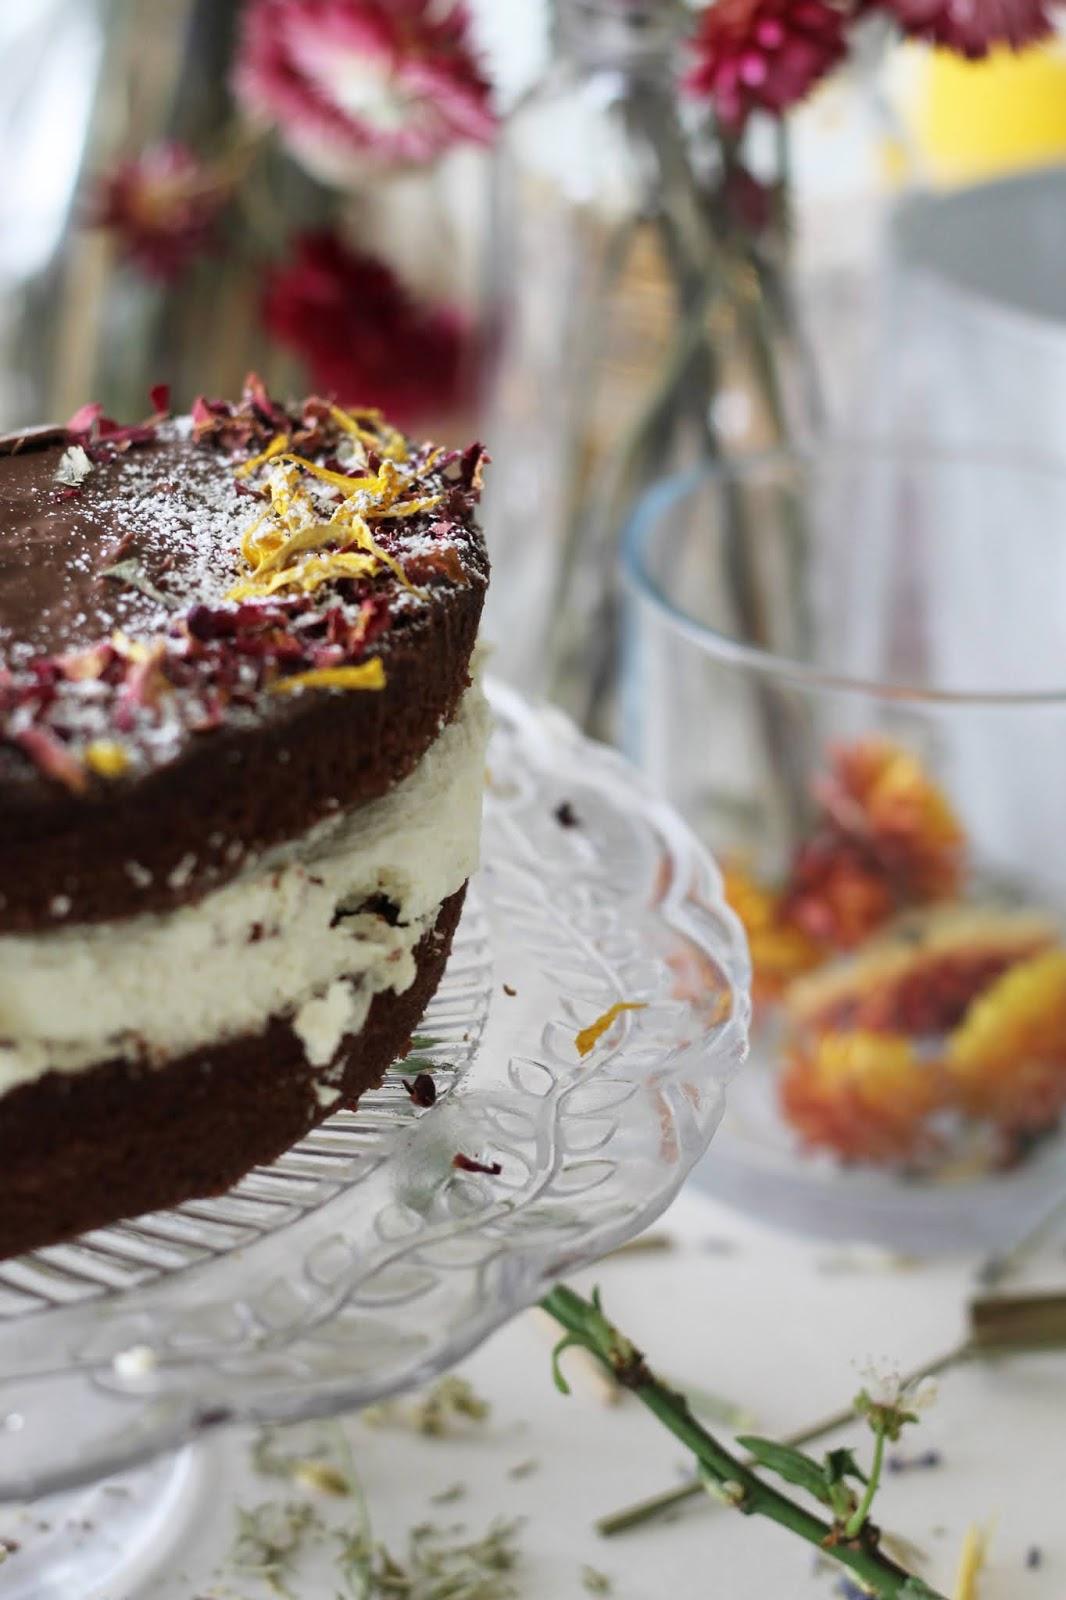 Petal_Cake_4